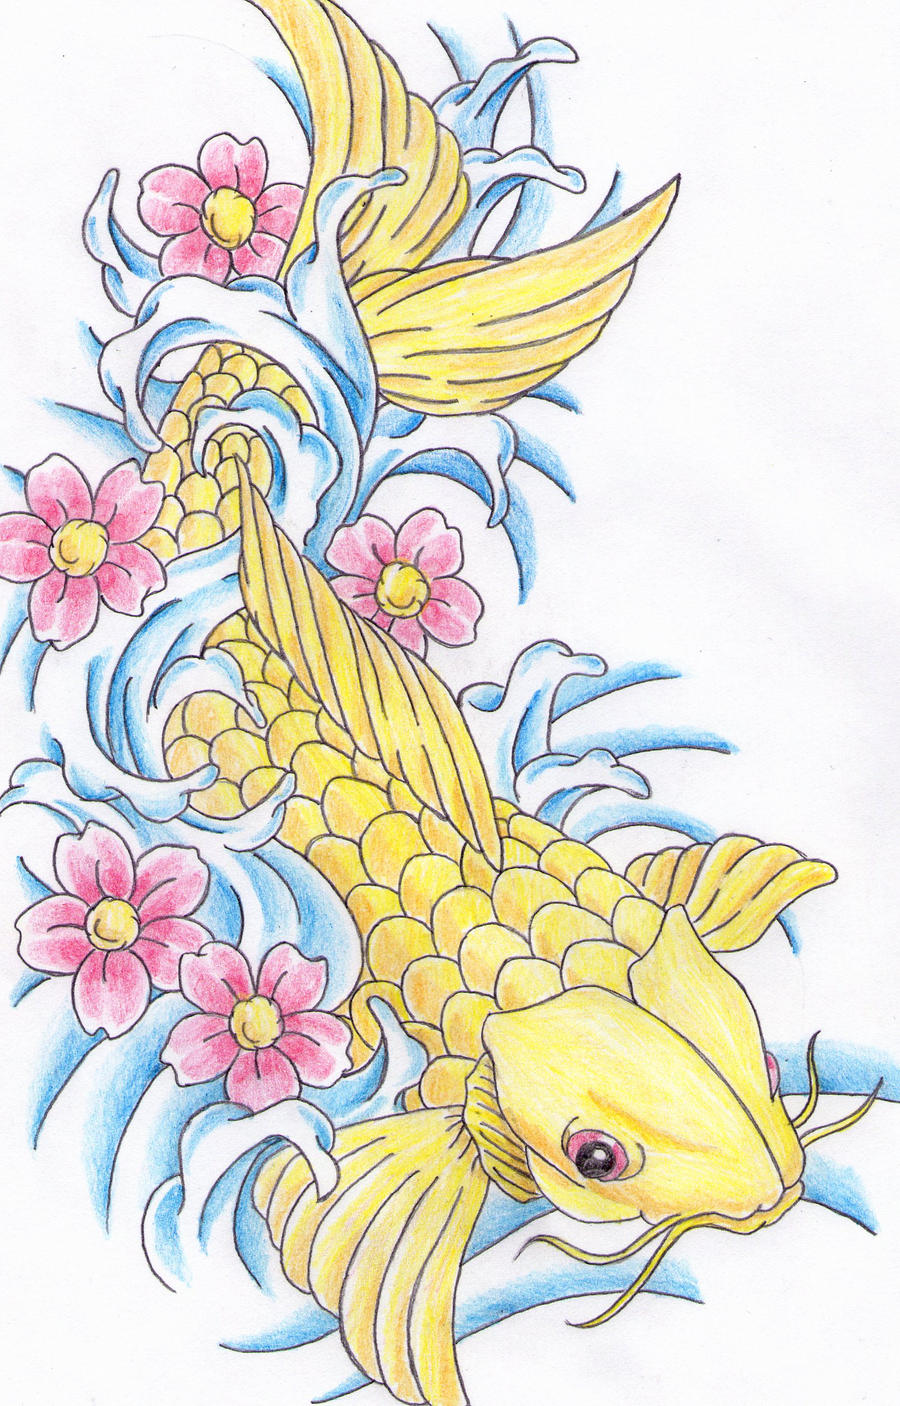 Koi Fish by patrickguitarist on DeviantArt